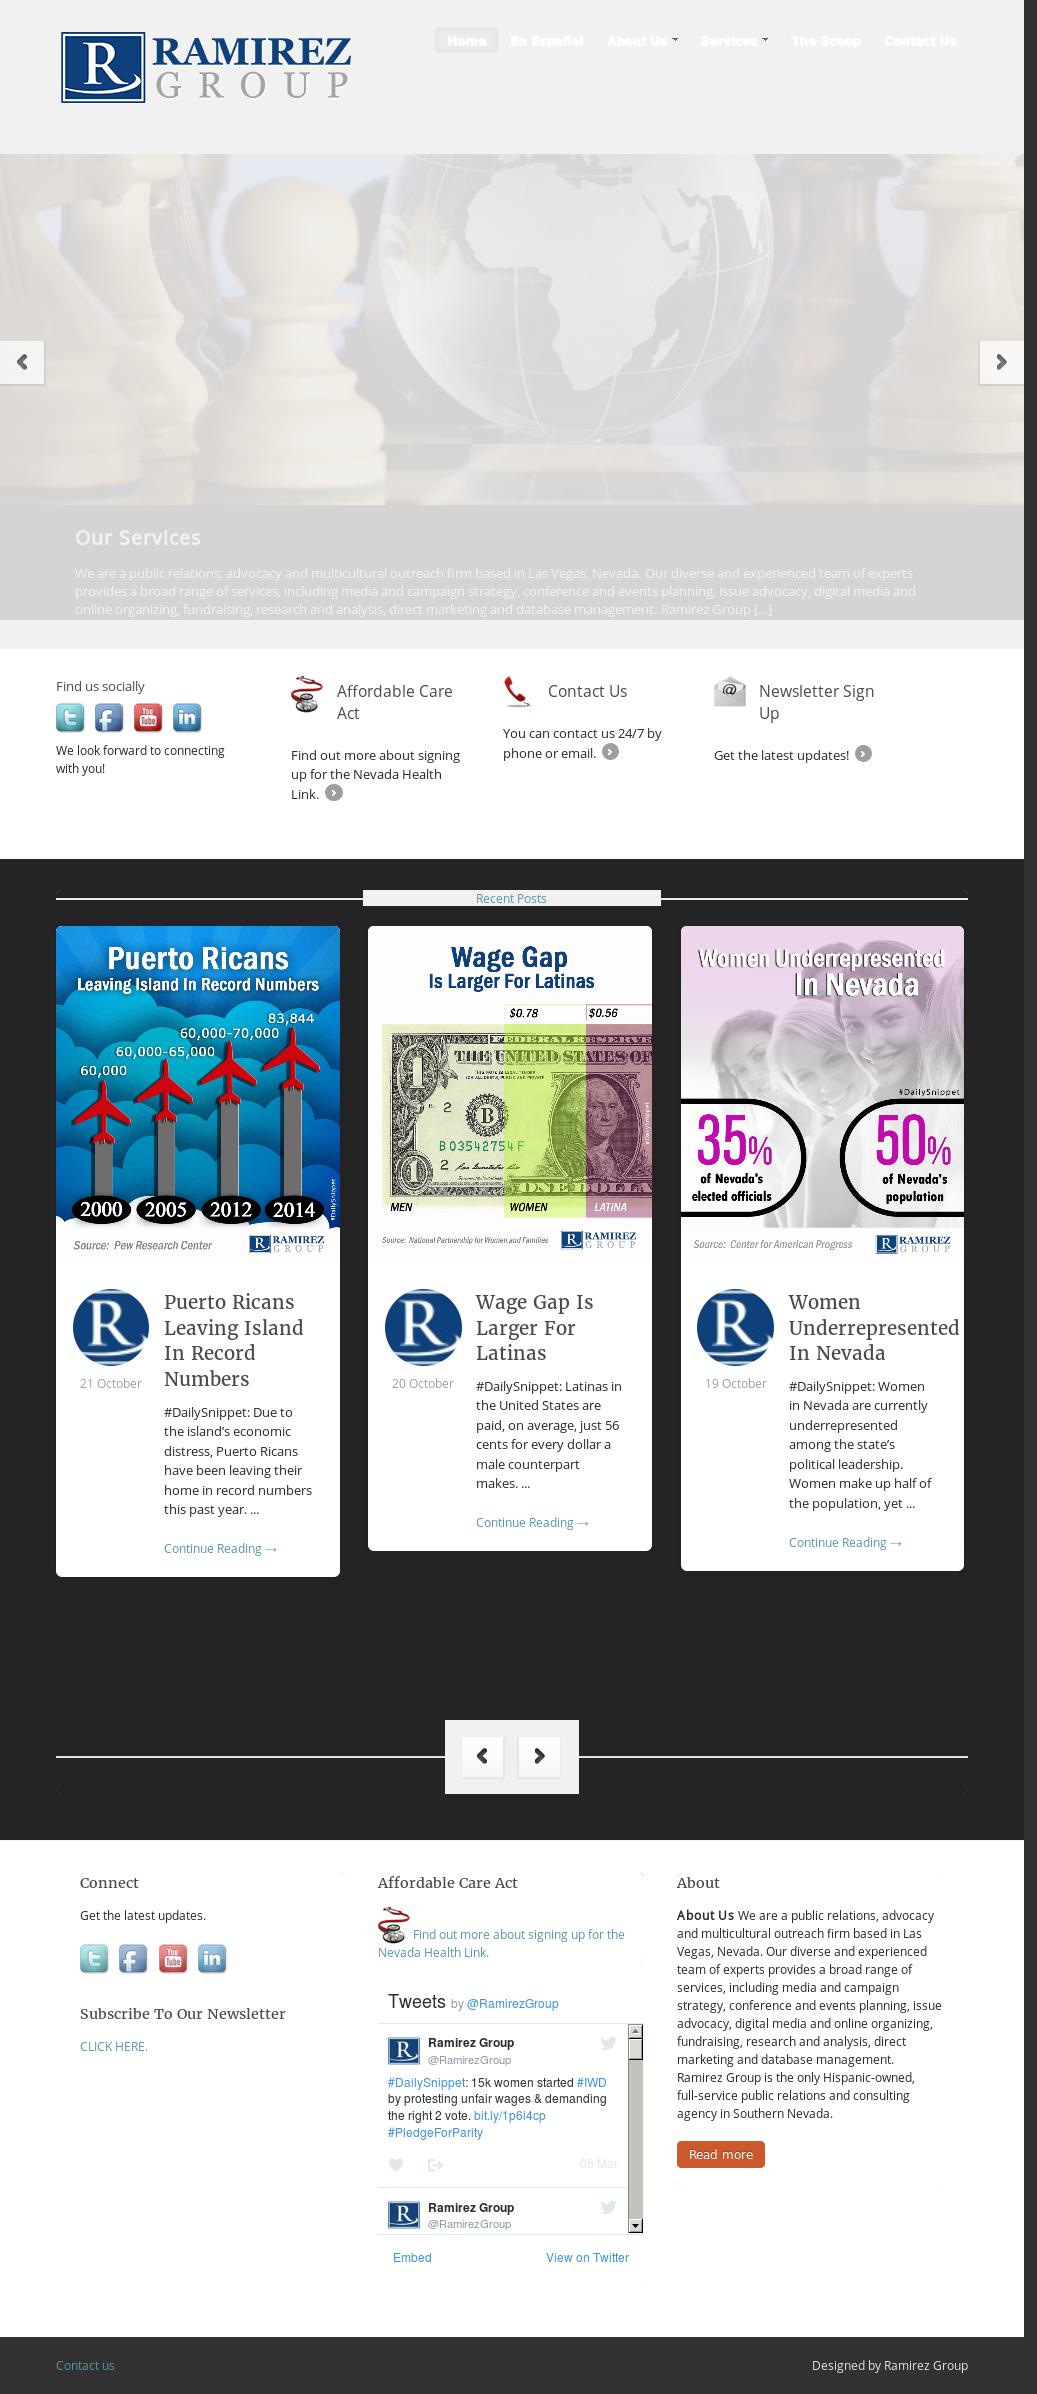 Ramirez Group Competitors, Revenue and Employees - Owler